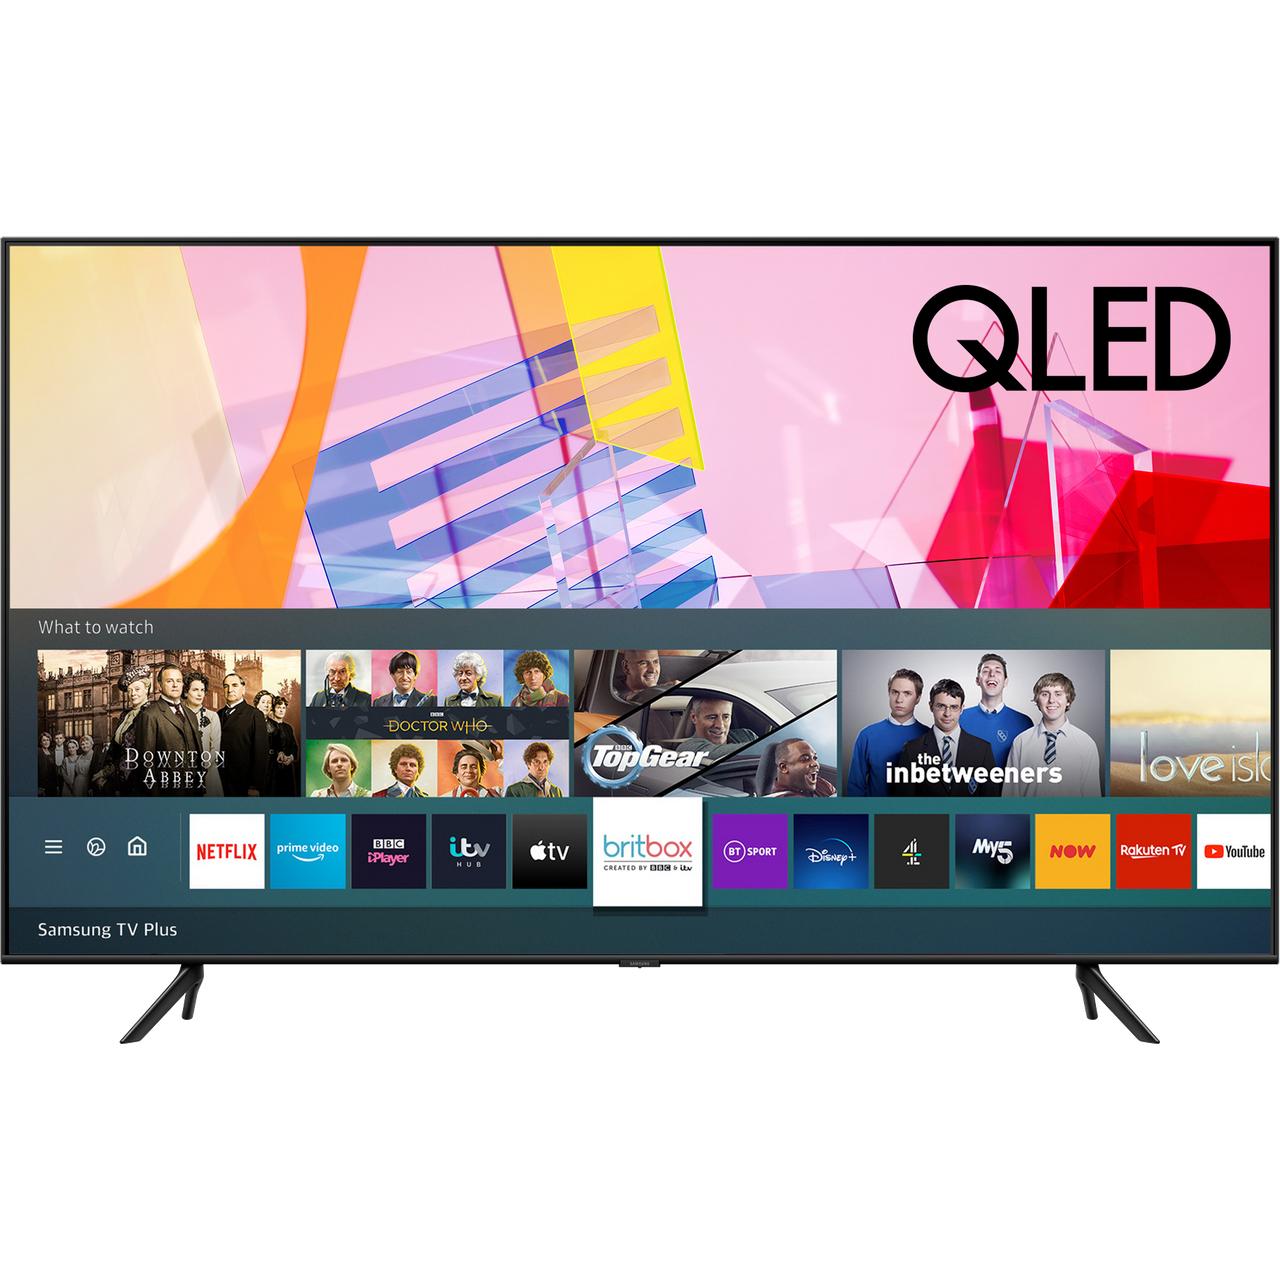 Samsung QE50Q60TA Q60T 50 Inch Smart 4K Ultra HD QLED Freeview HD and Freesat £559.55 at AO ebay